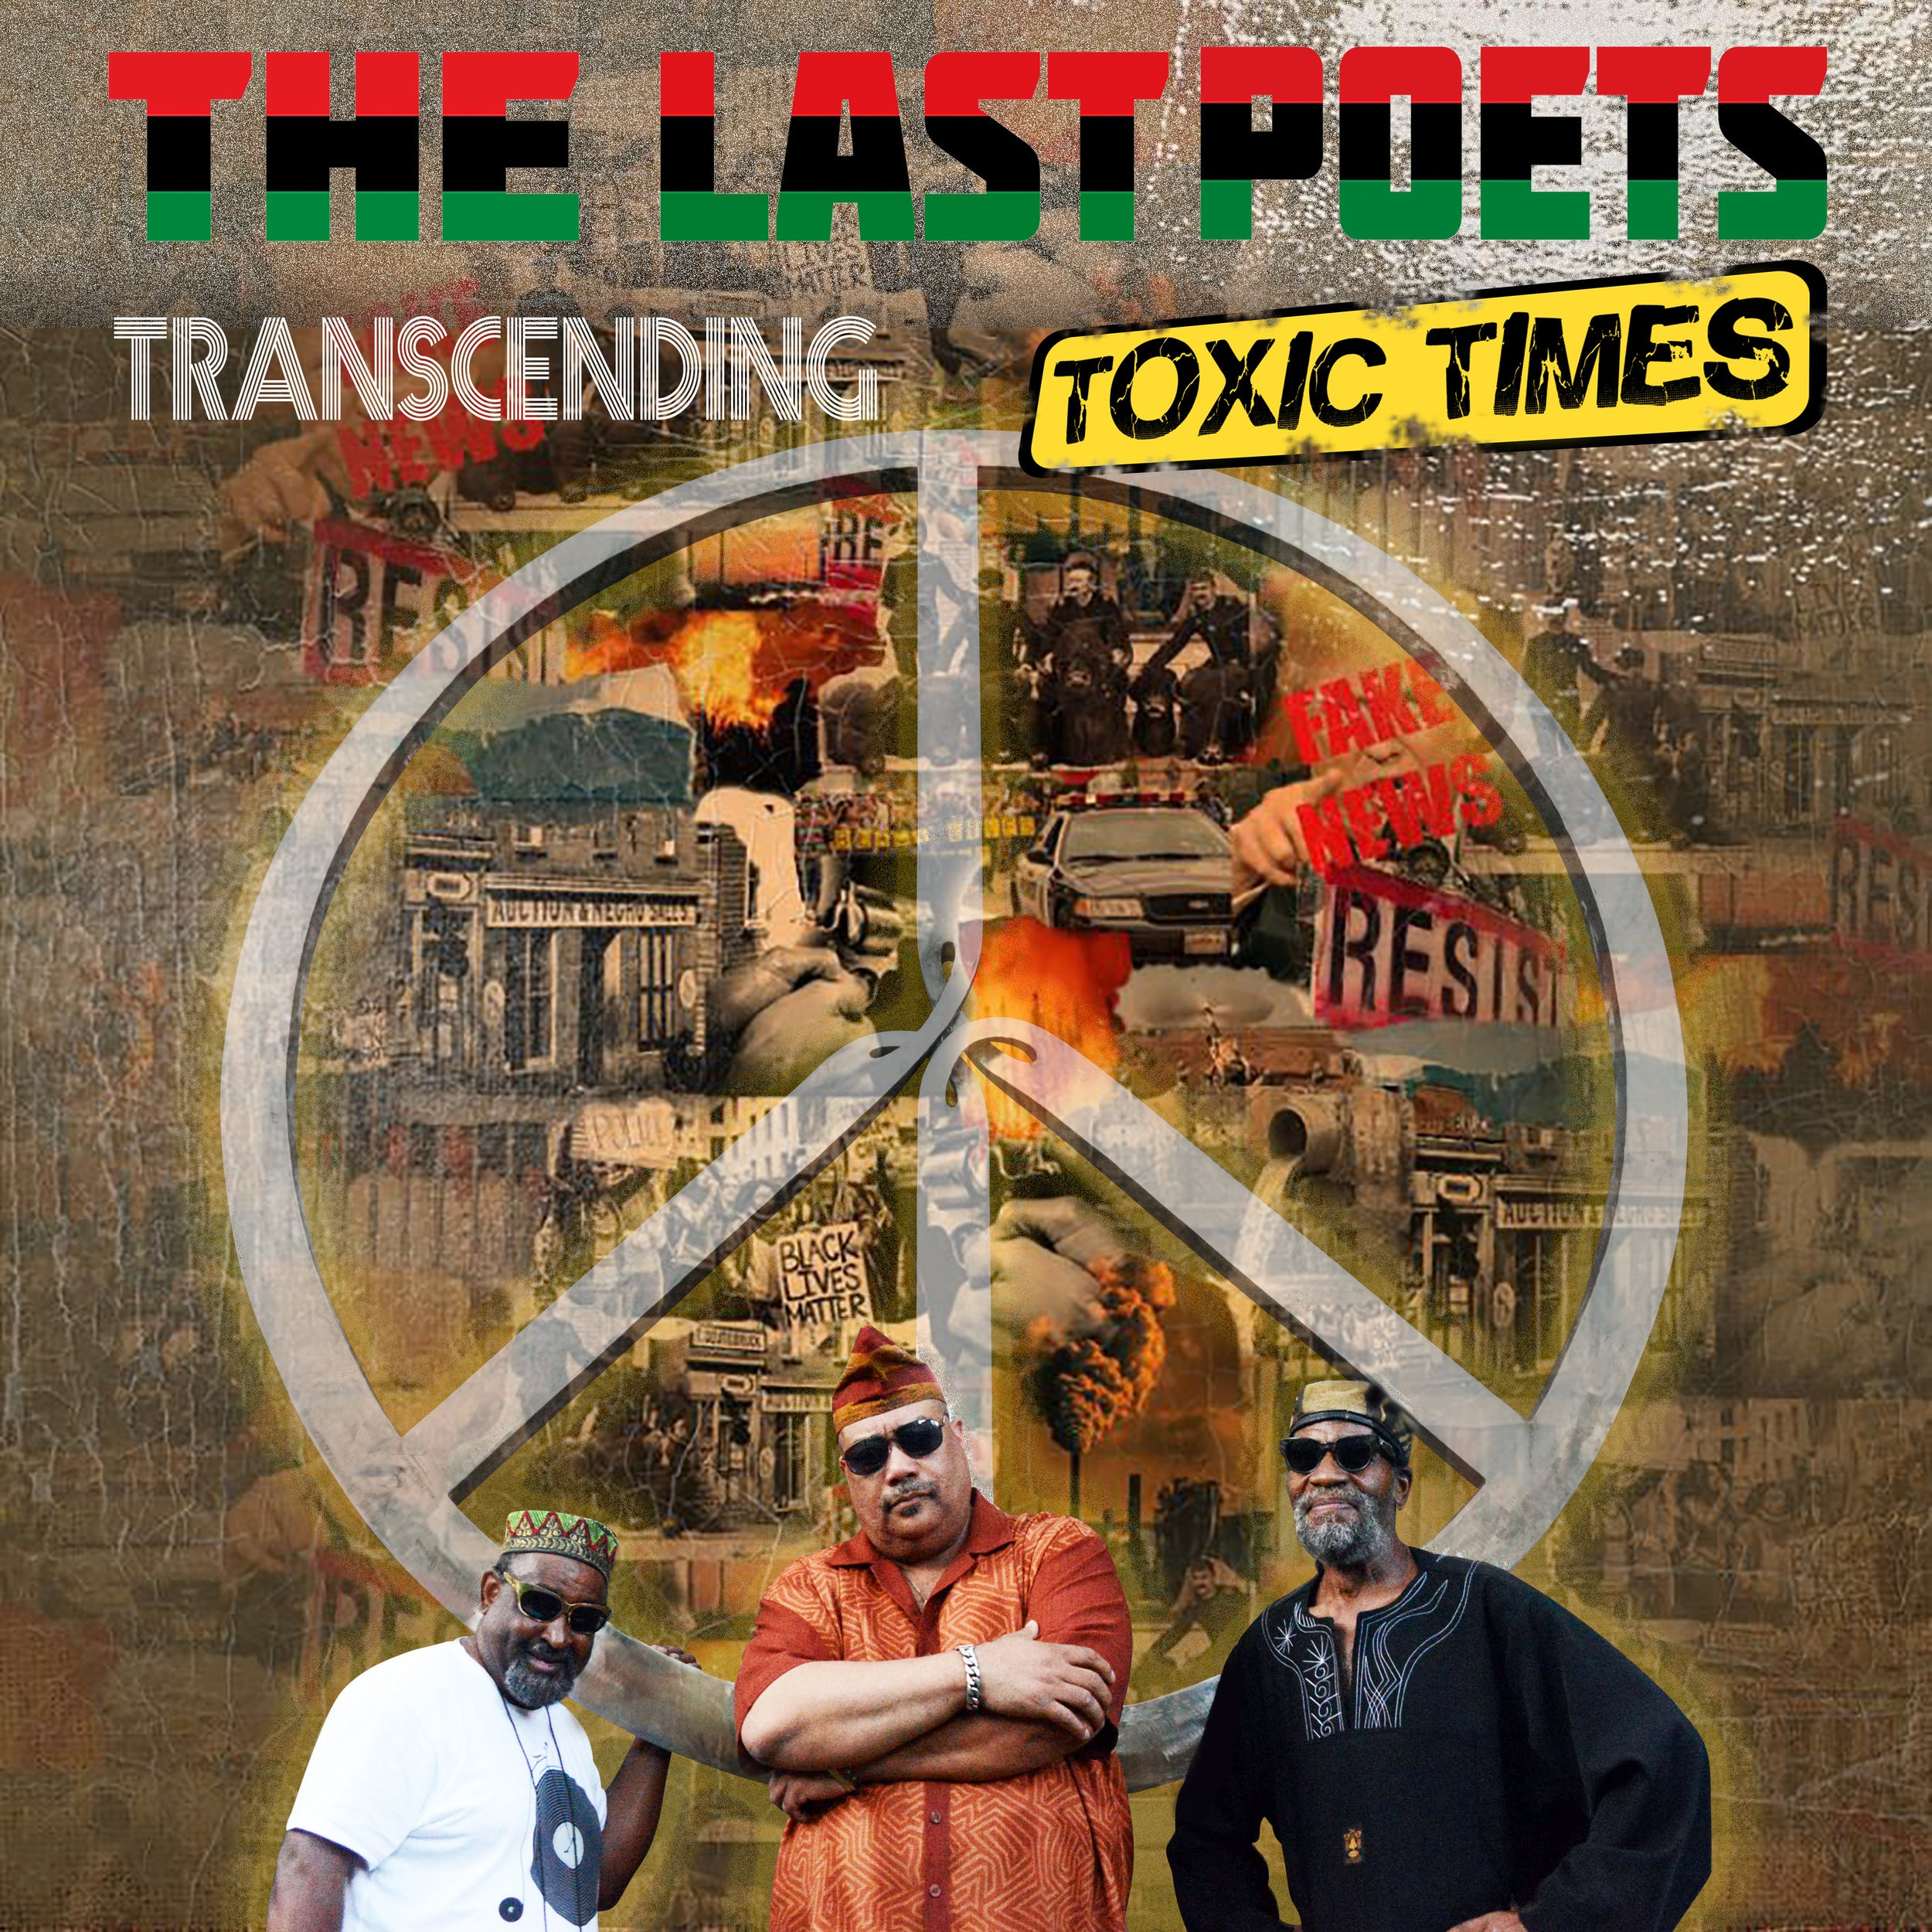 TLP+Transcending+Toxic+Times+Cover+final+.jpg